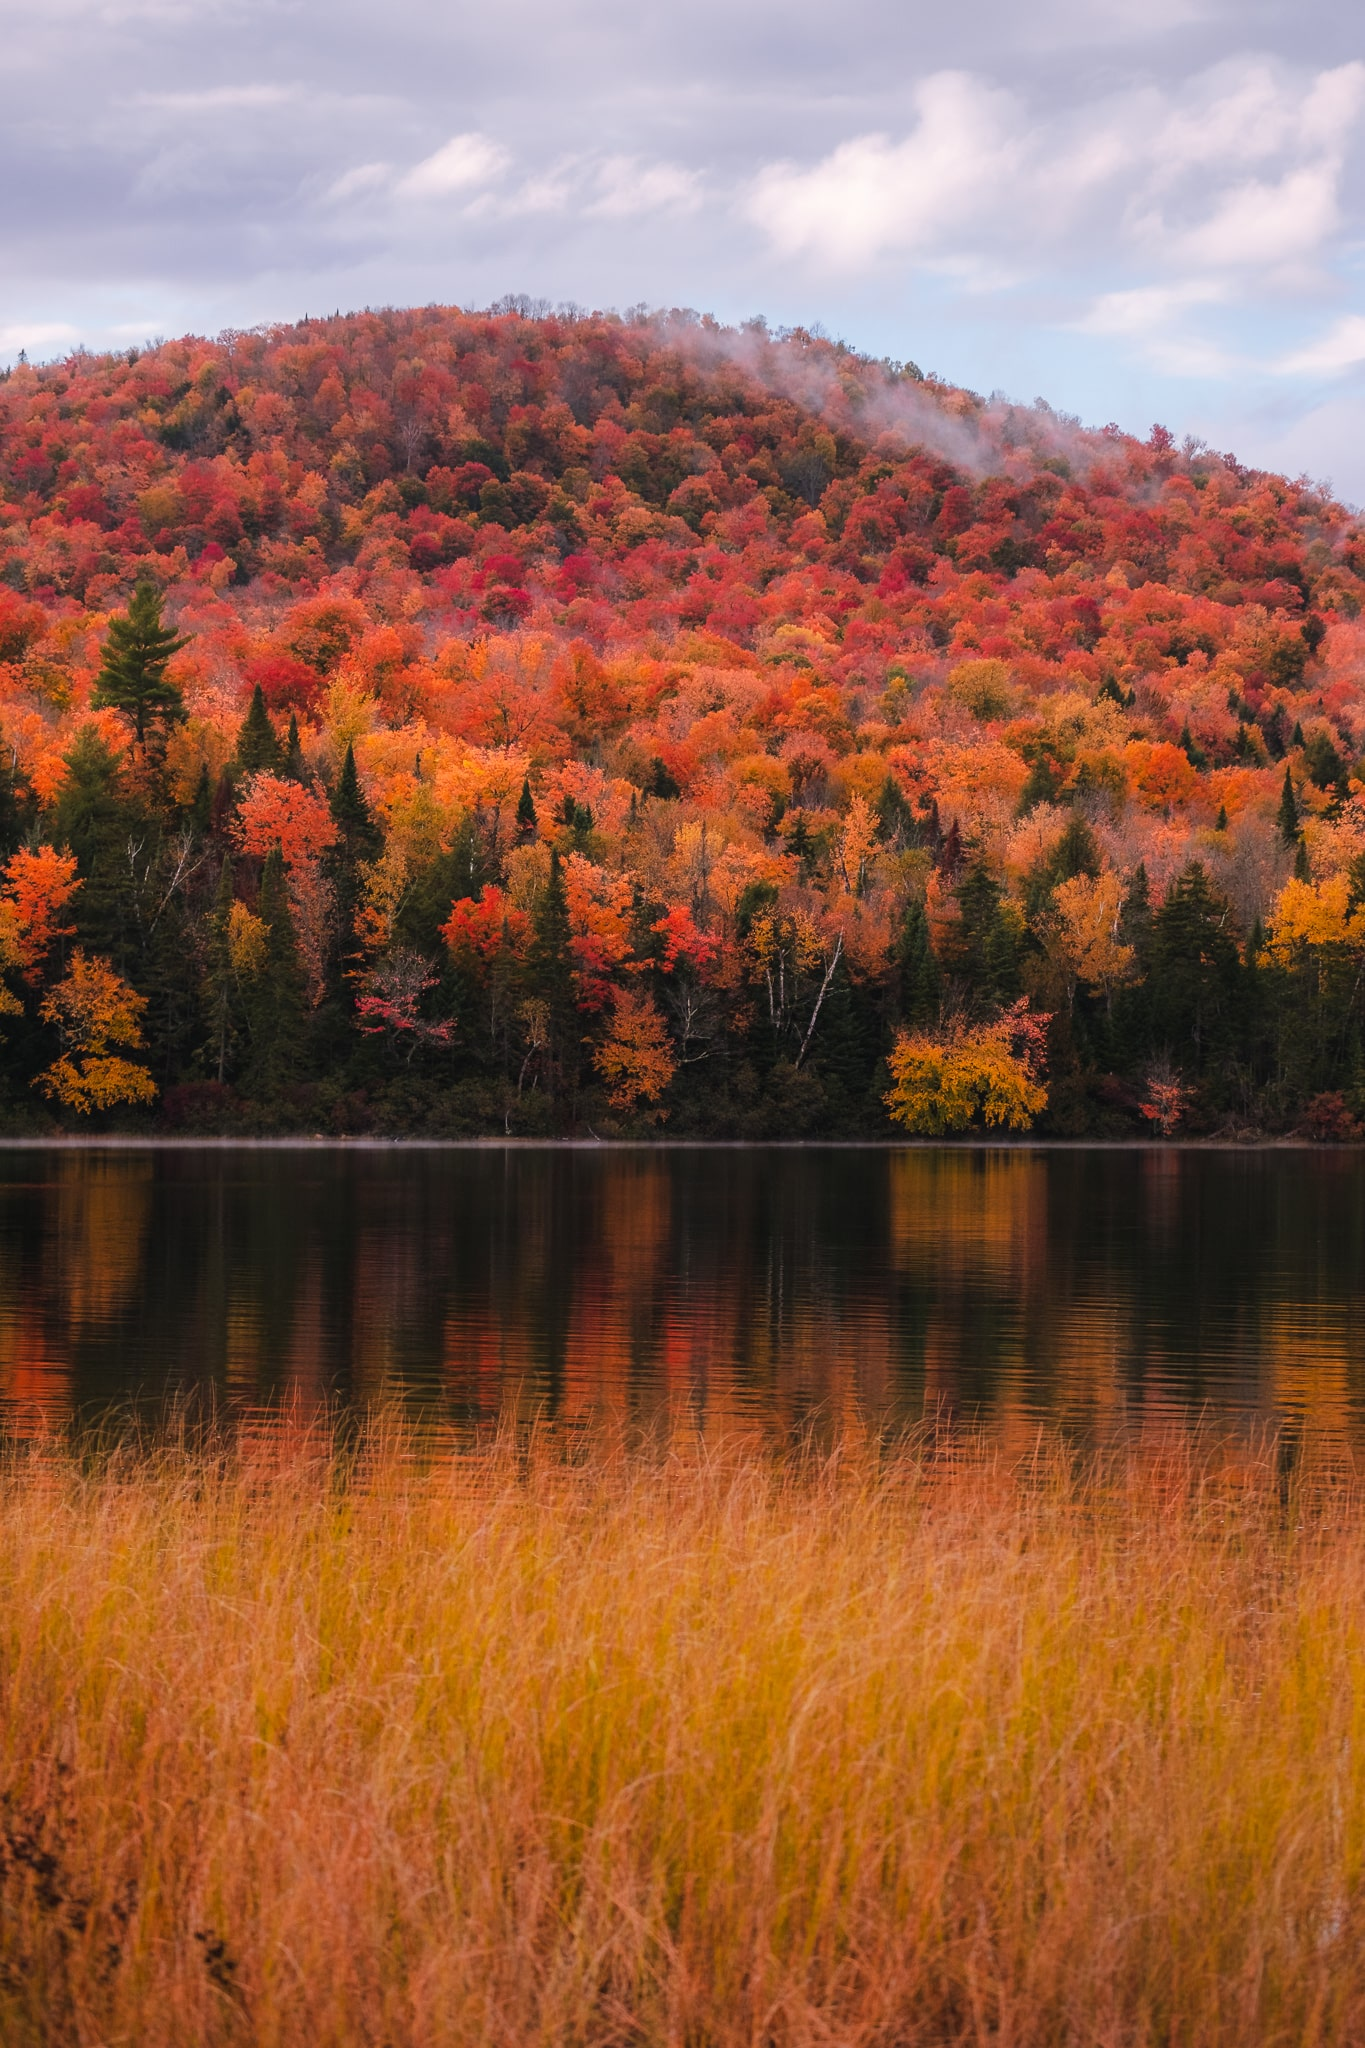 Peak foliage season in New York